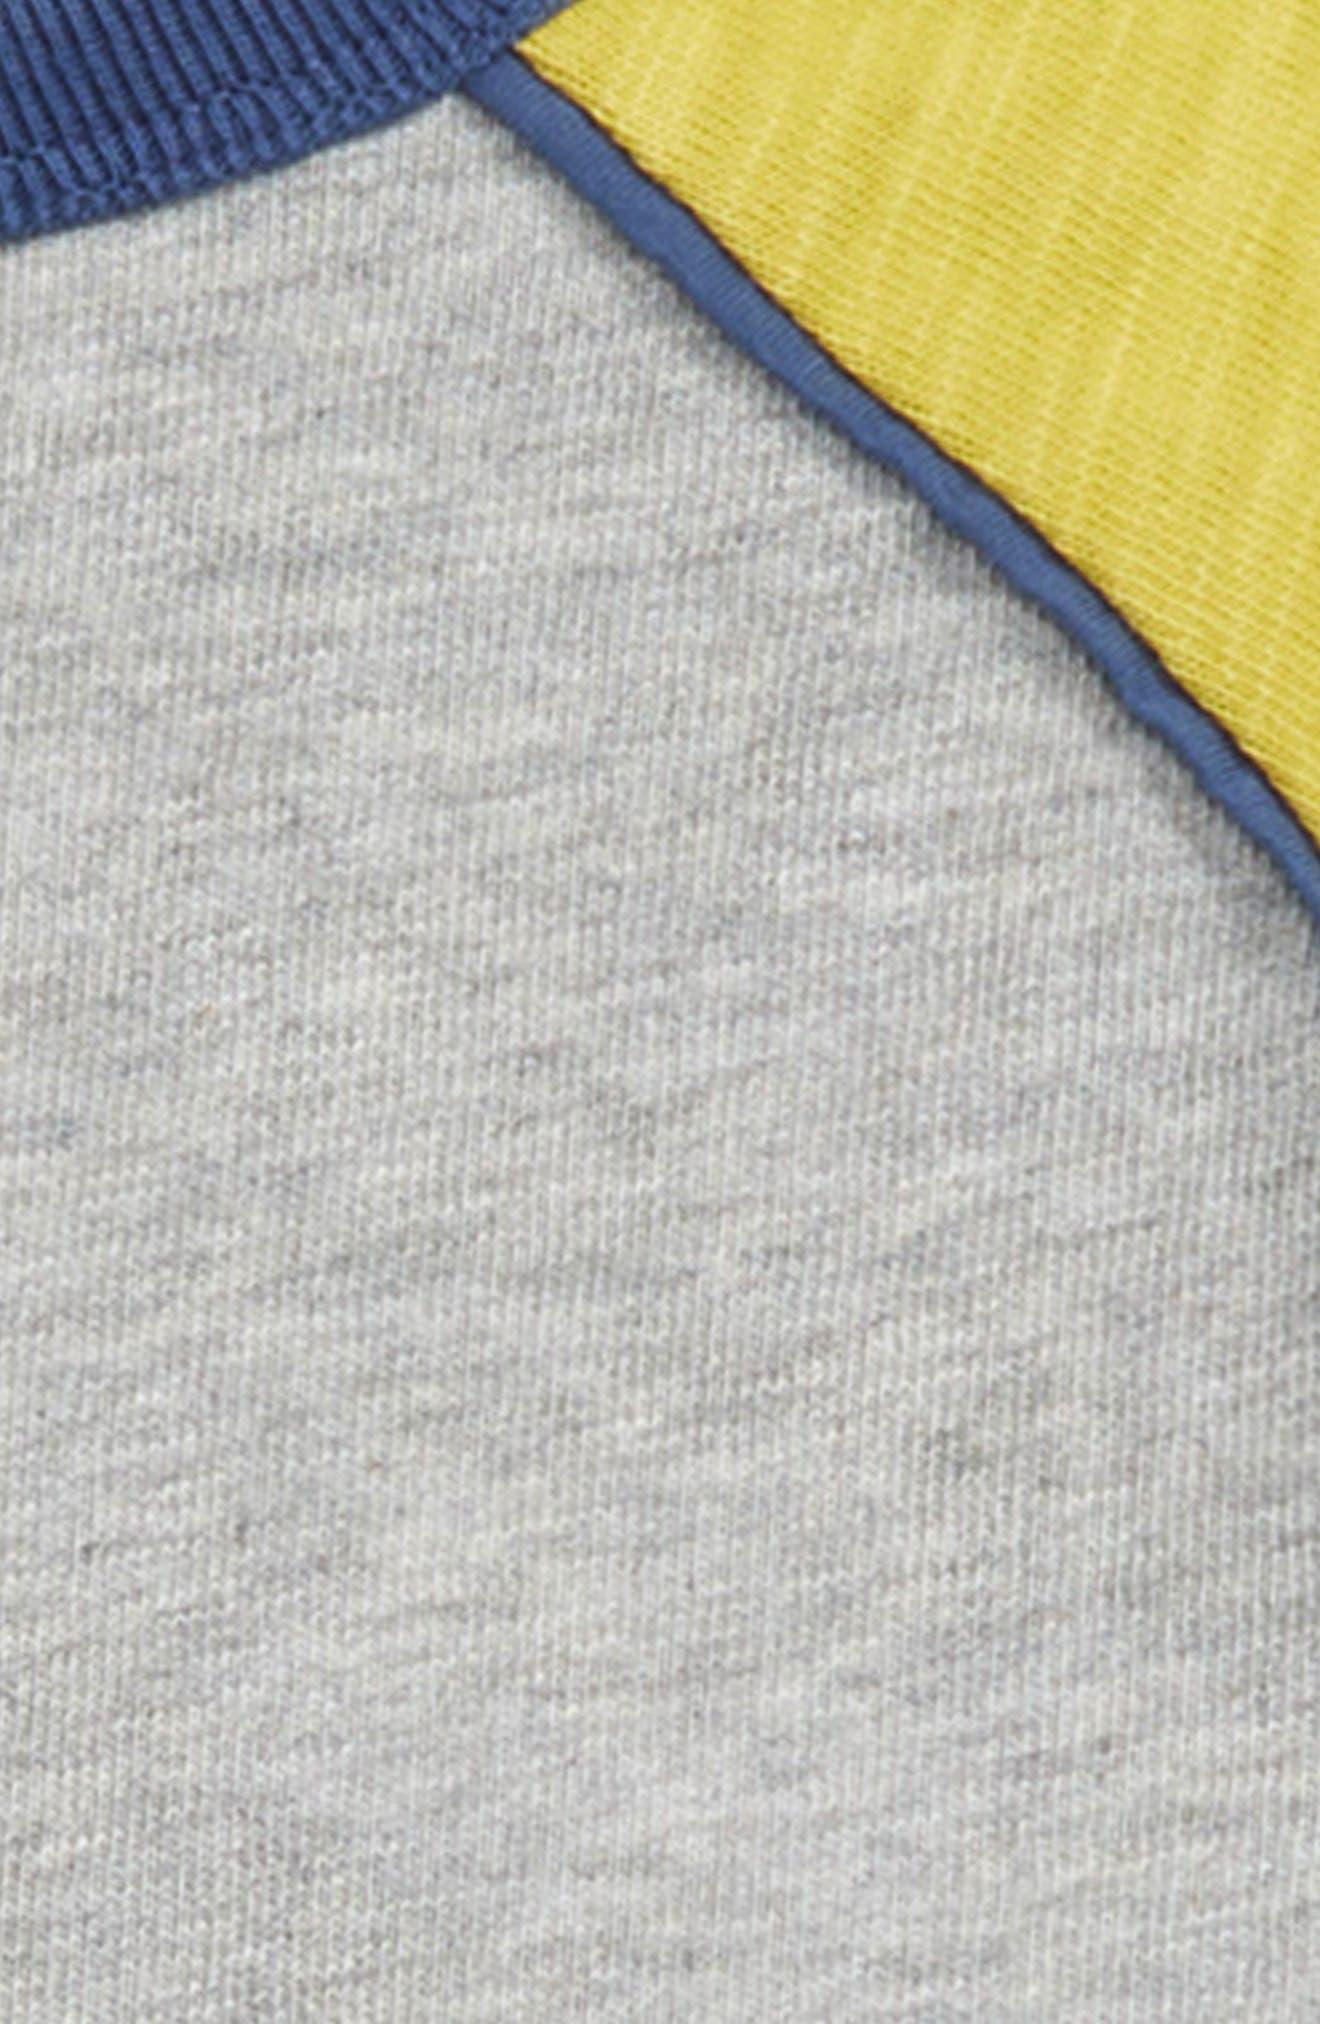 Raglan T-Shirt,                             Alternate thumbnail 2, color,                             GREY MARL/ CELERY YELLOW